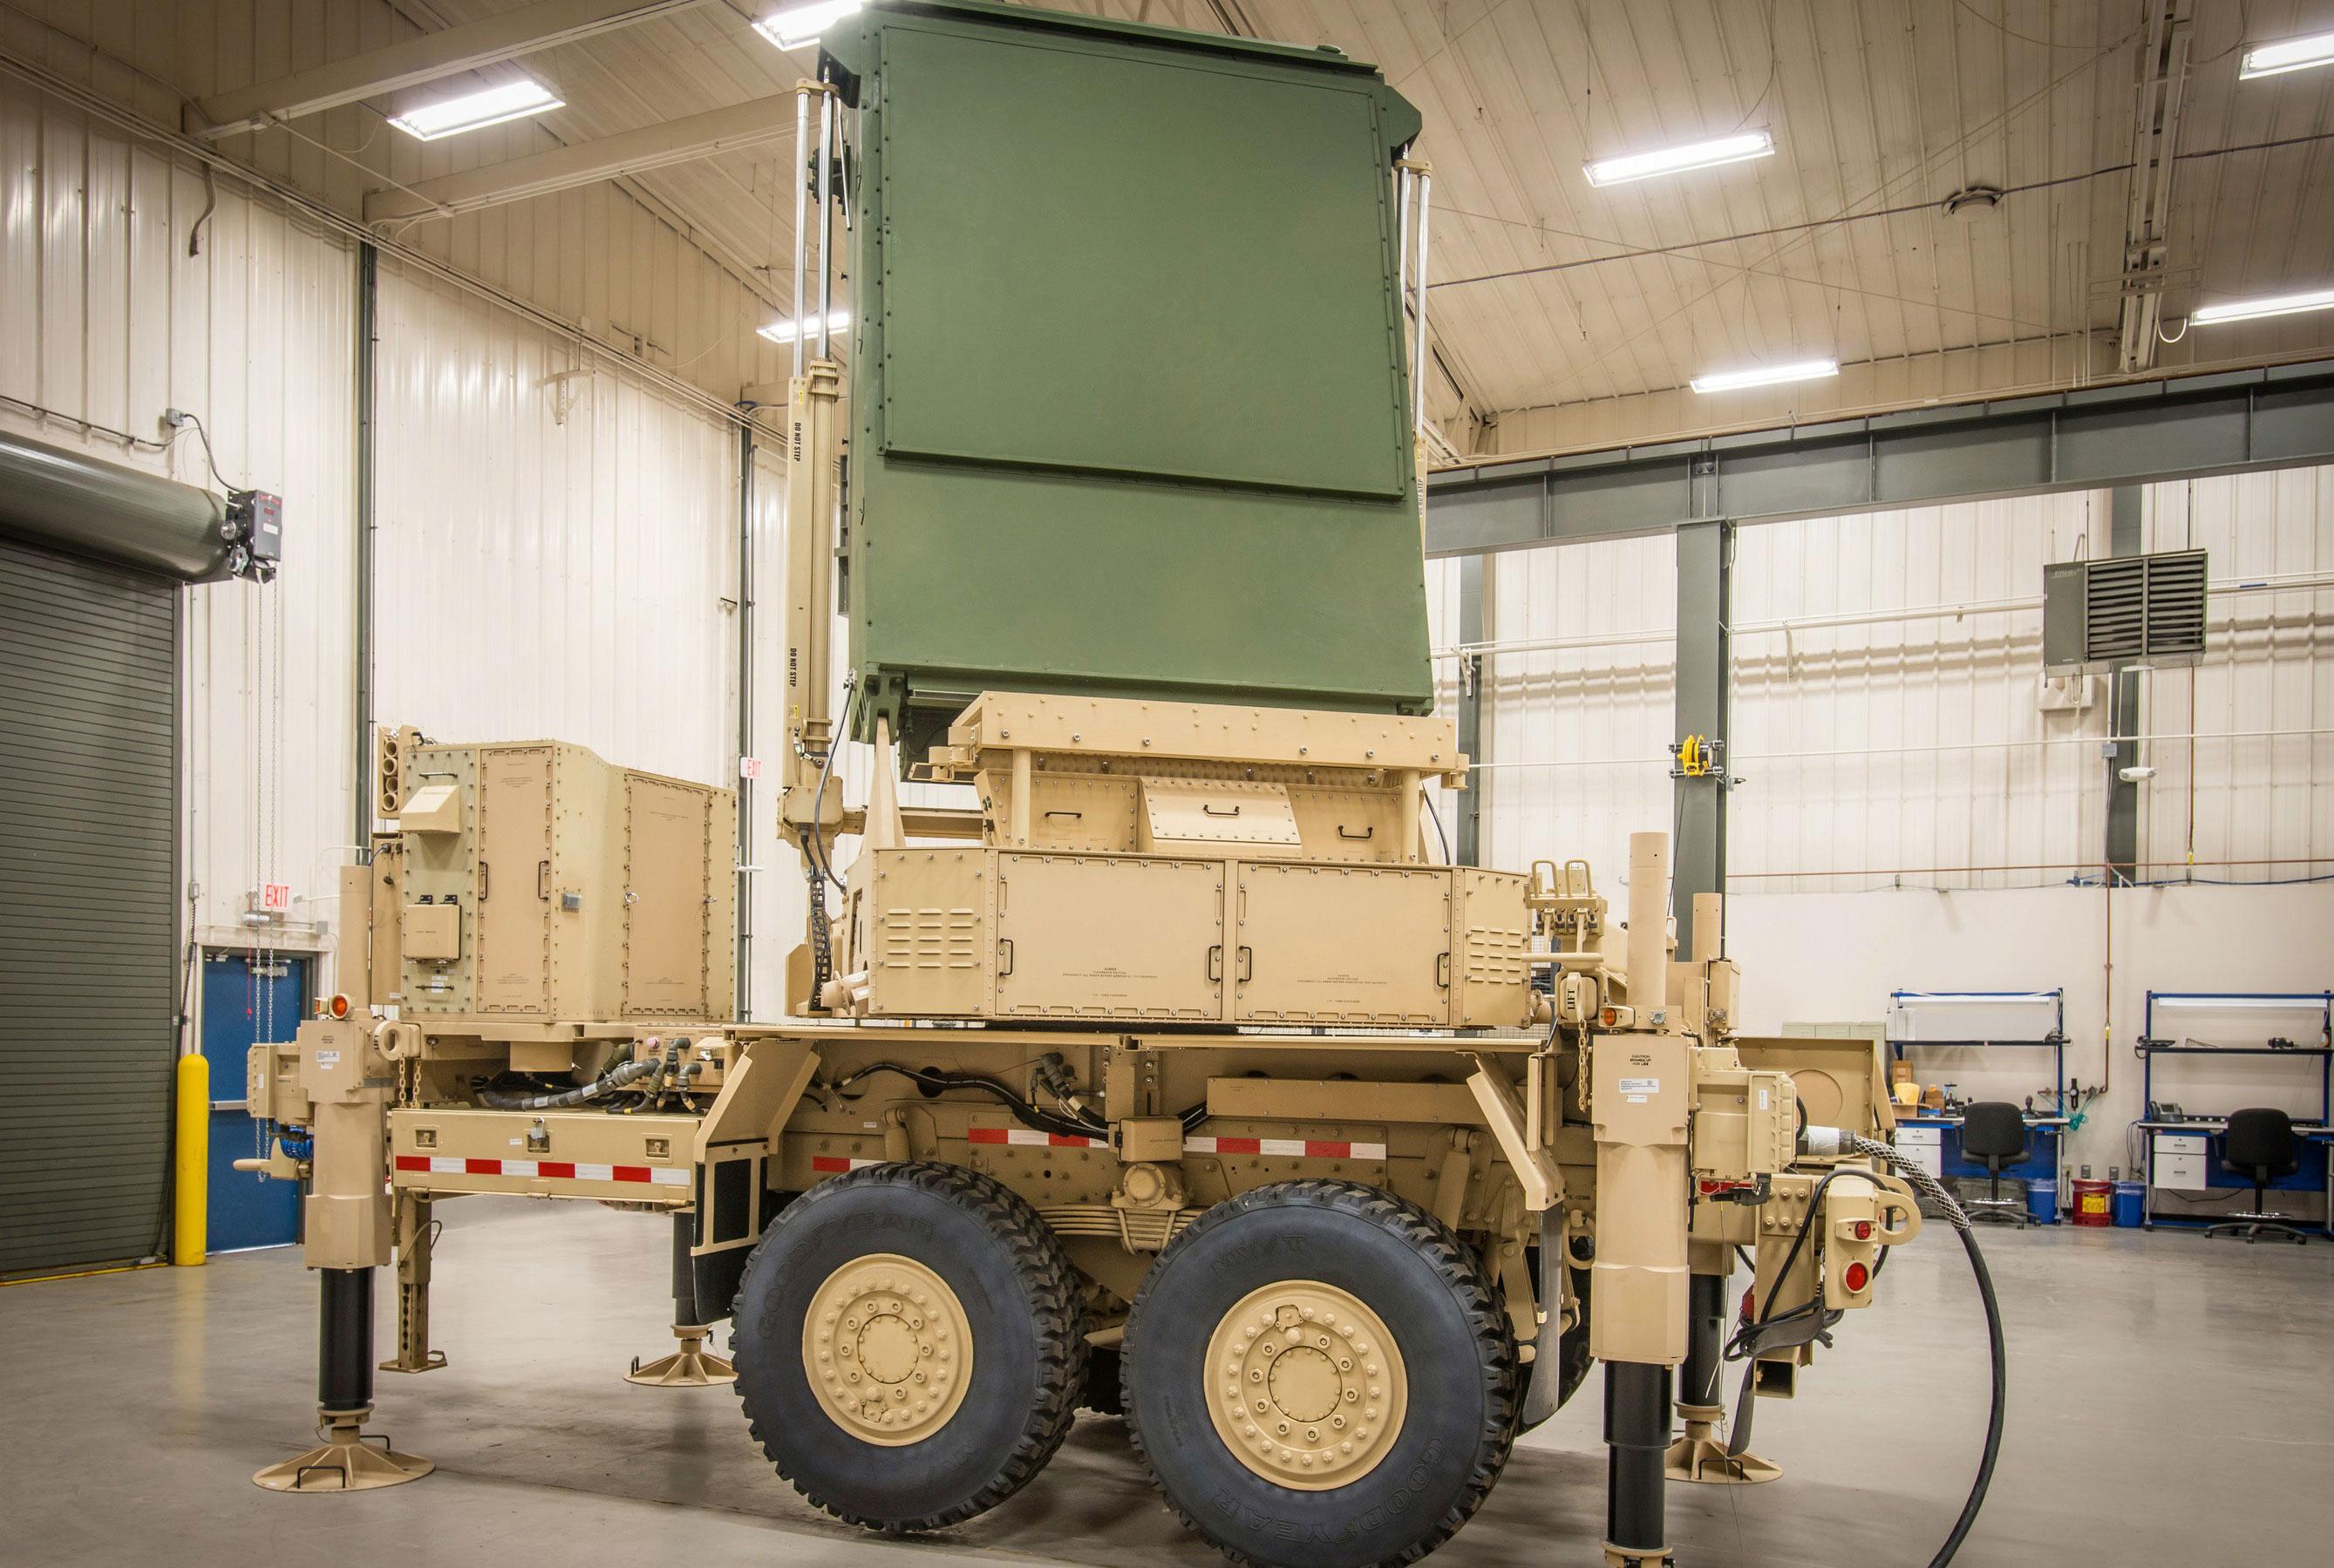 Lockheed Martin Unveils GaN-based Radar Technology